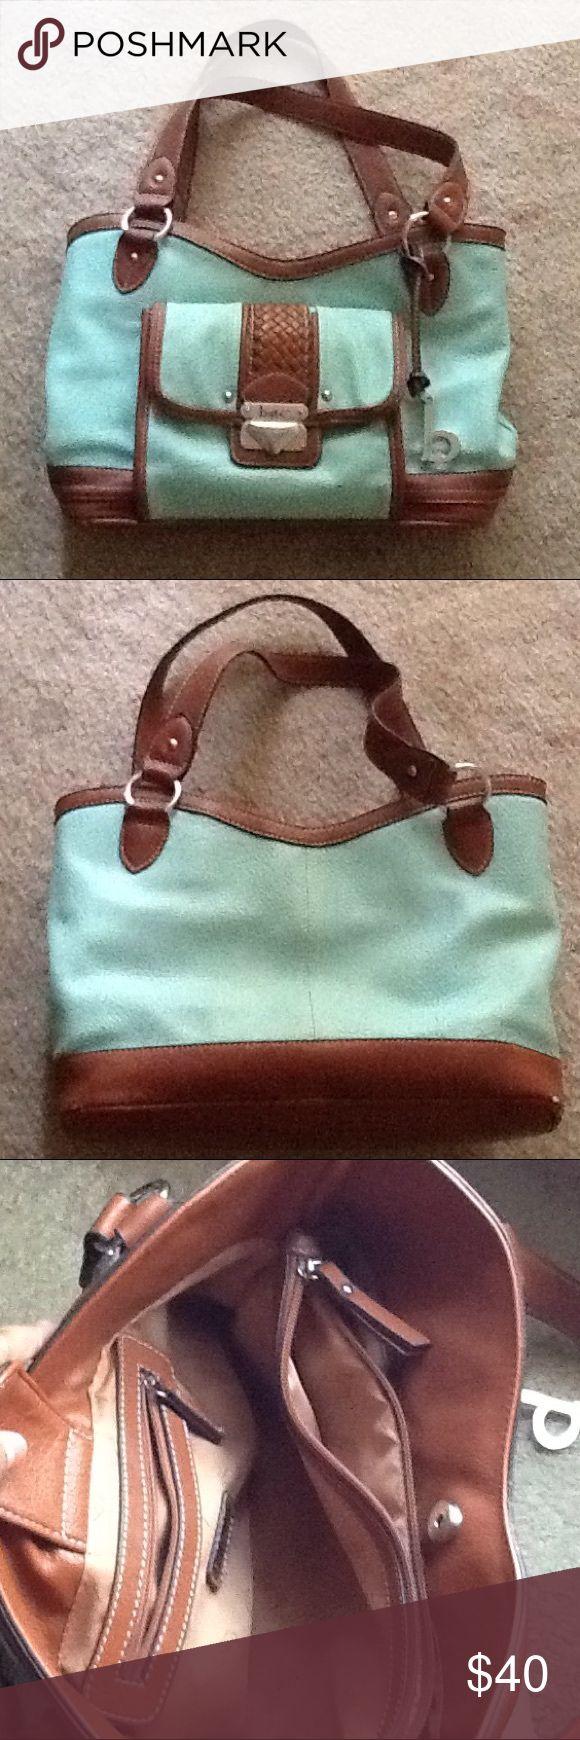 B.O.C. Purse B.O.C. Mint purse, hardly used. b.o.c. Bags Shoulder Bags